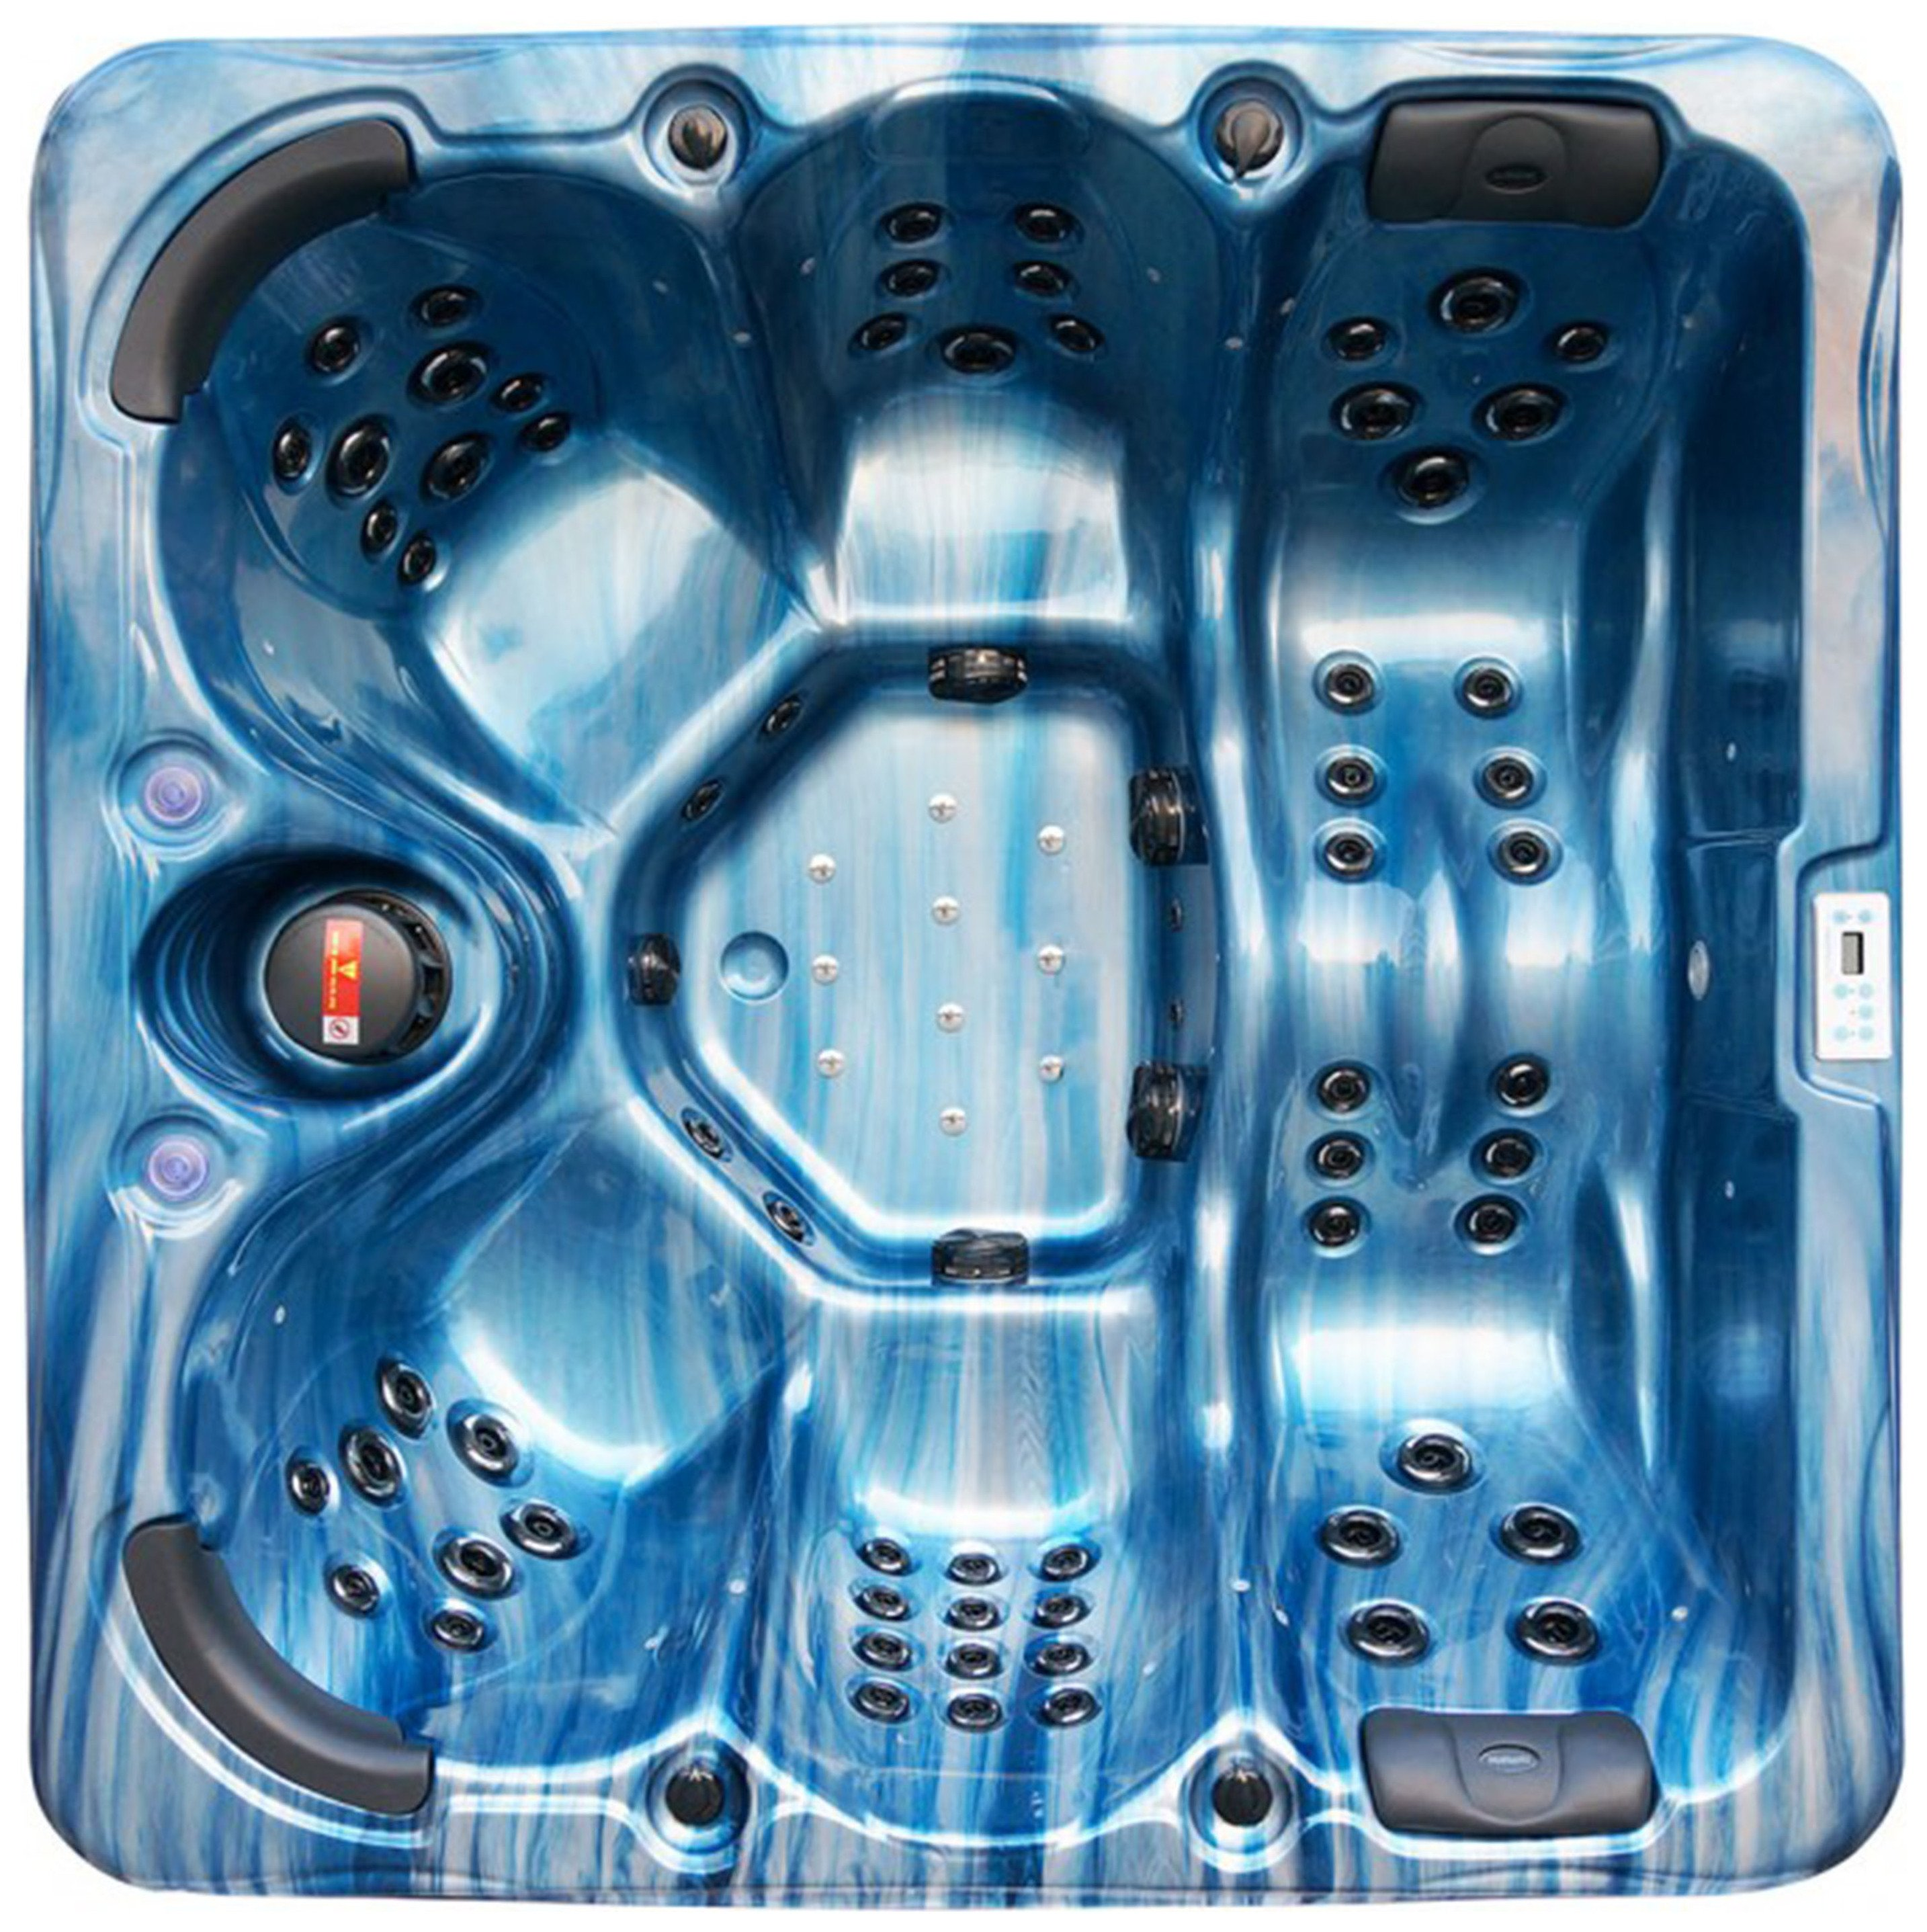 Malibu Deluxe Hot Tub. lowest price